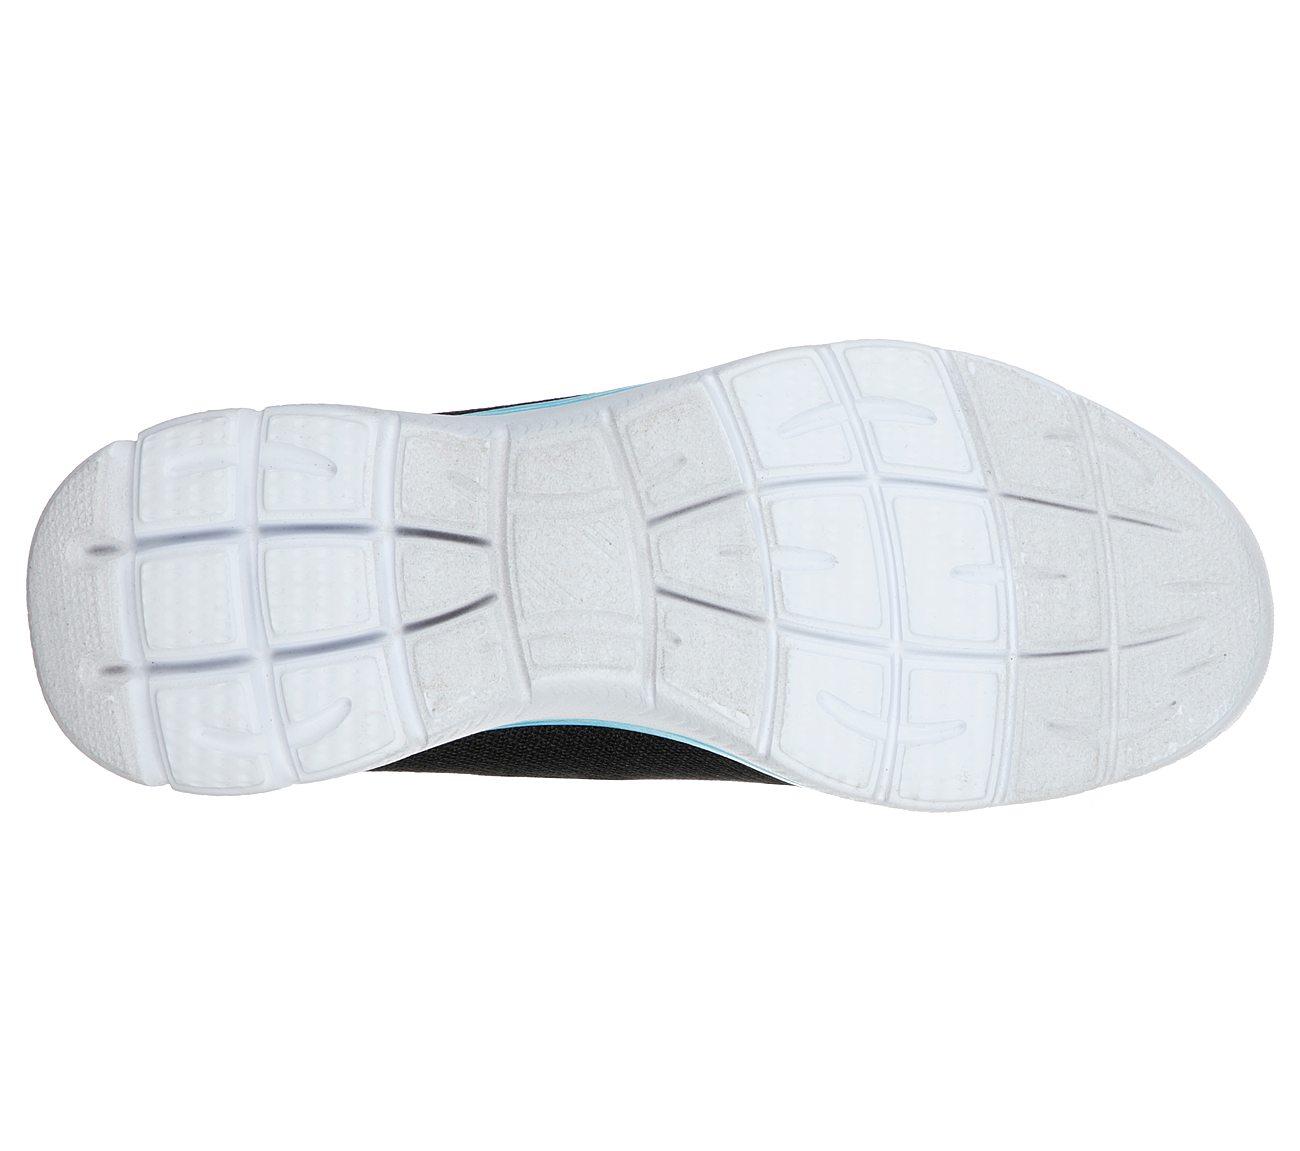 zapatillas balonmano mizuno hombre amazon ofertas baratas usa